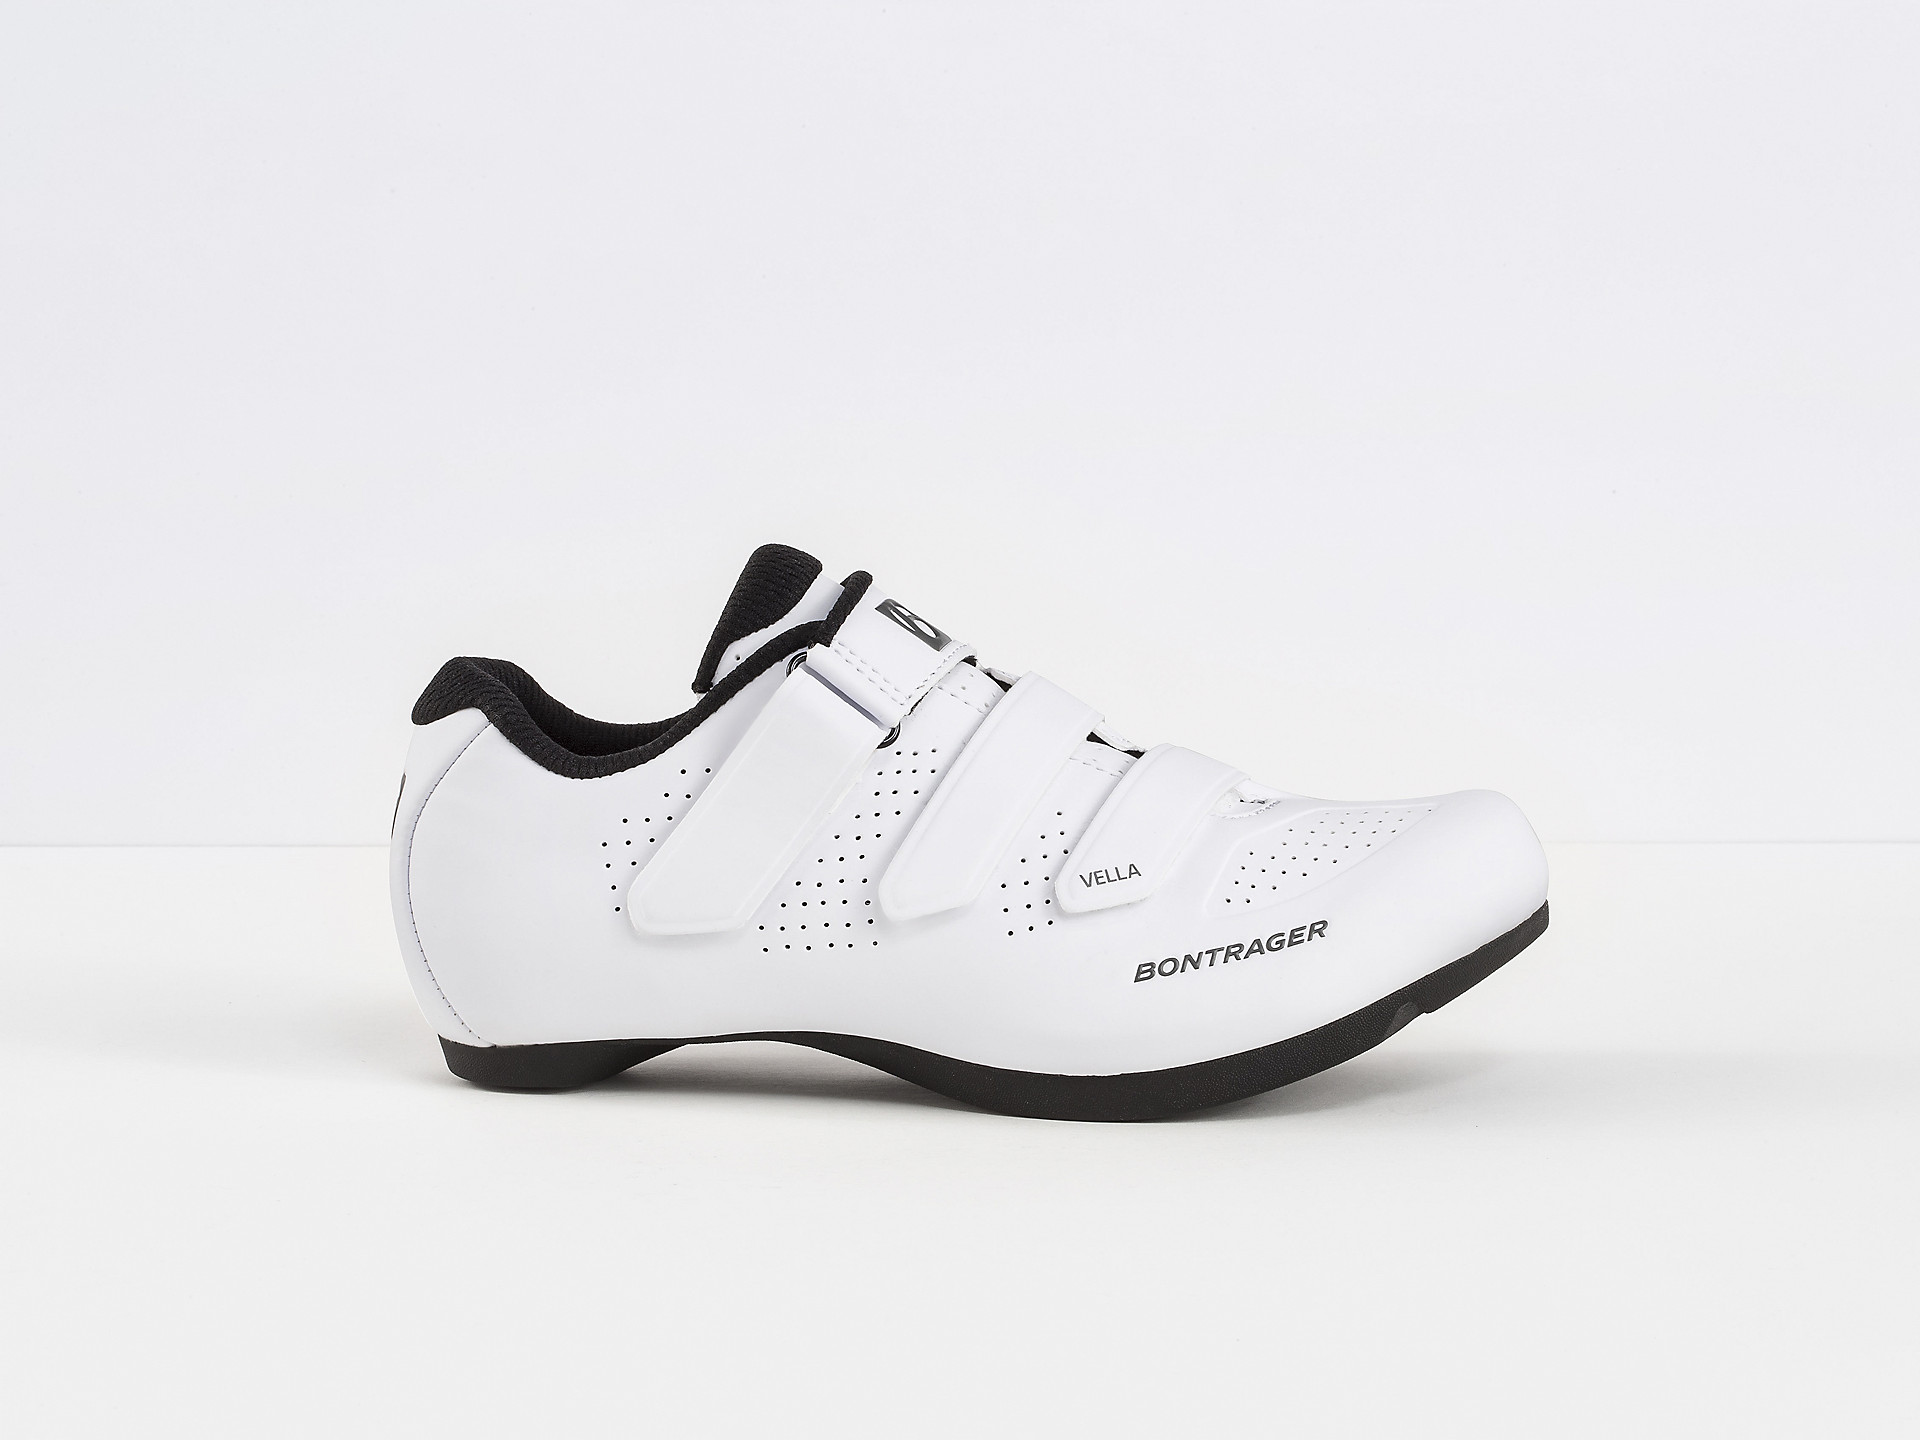 99a6fbce74 Bontrager Vella Women s Road Shoe